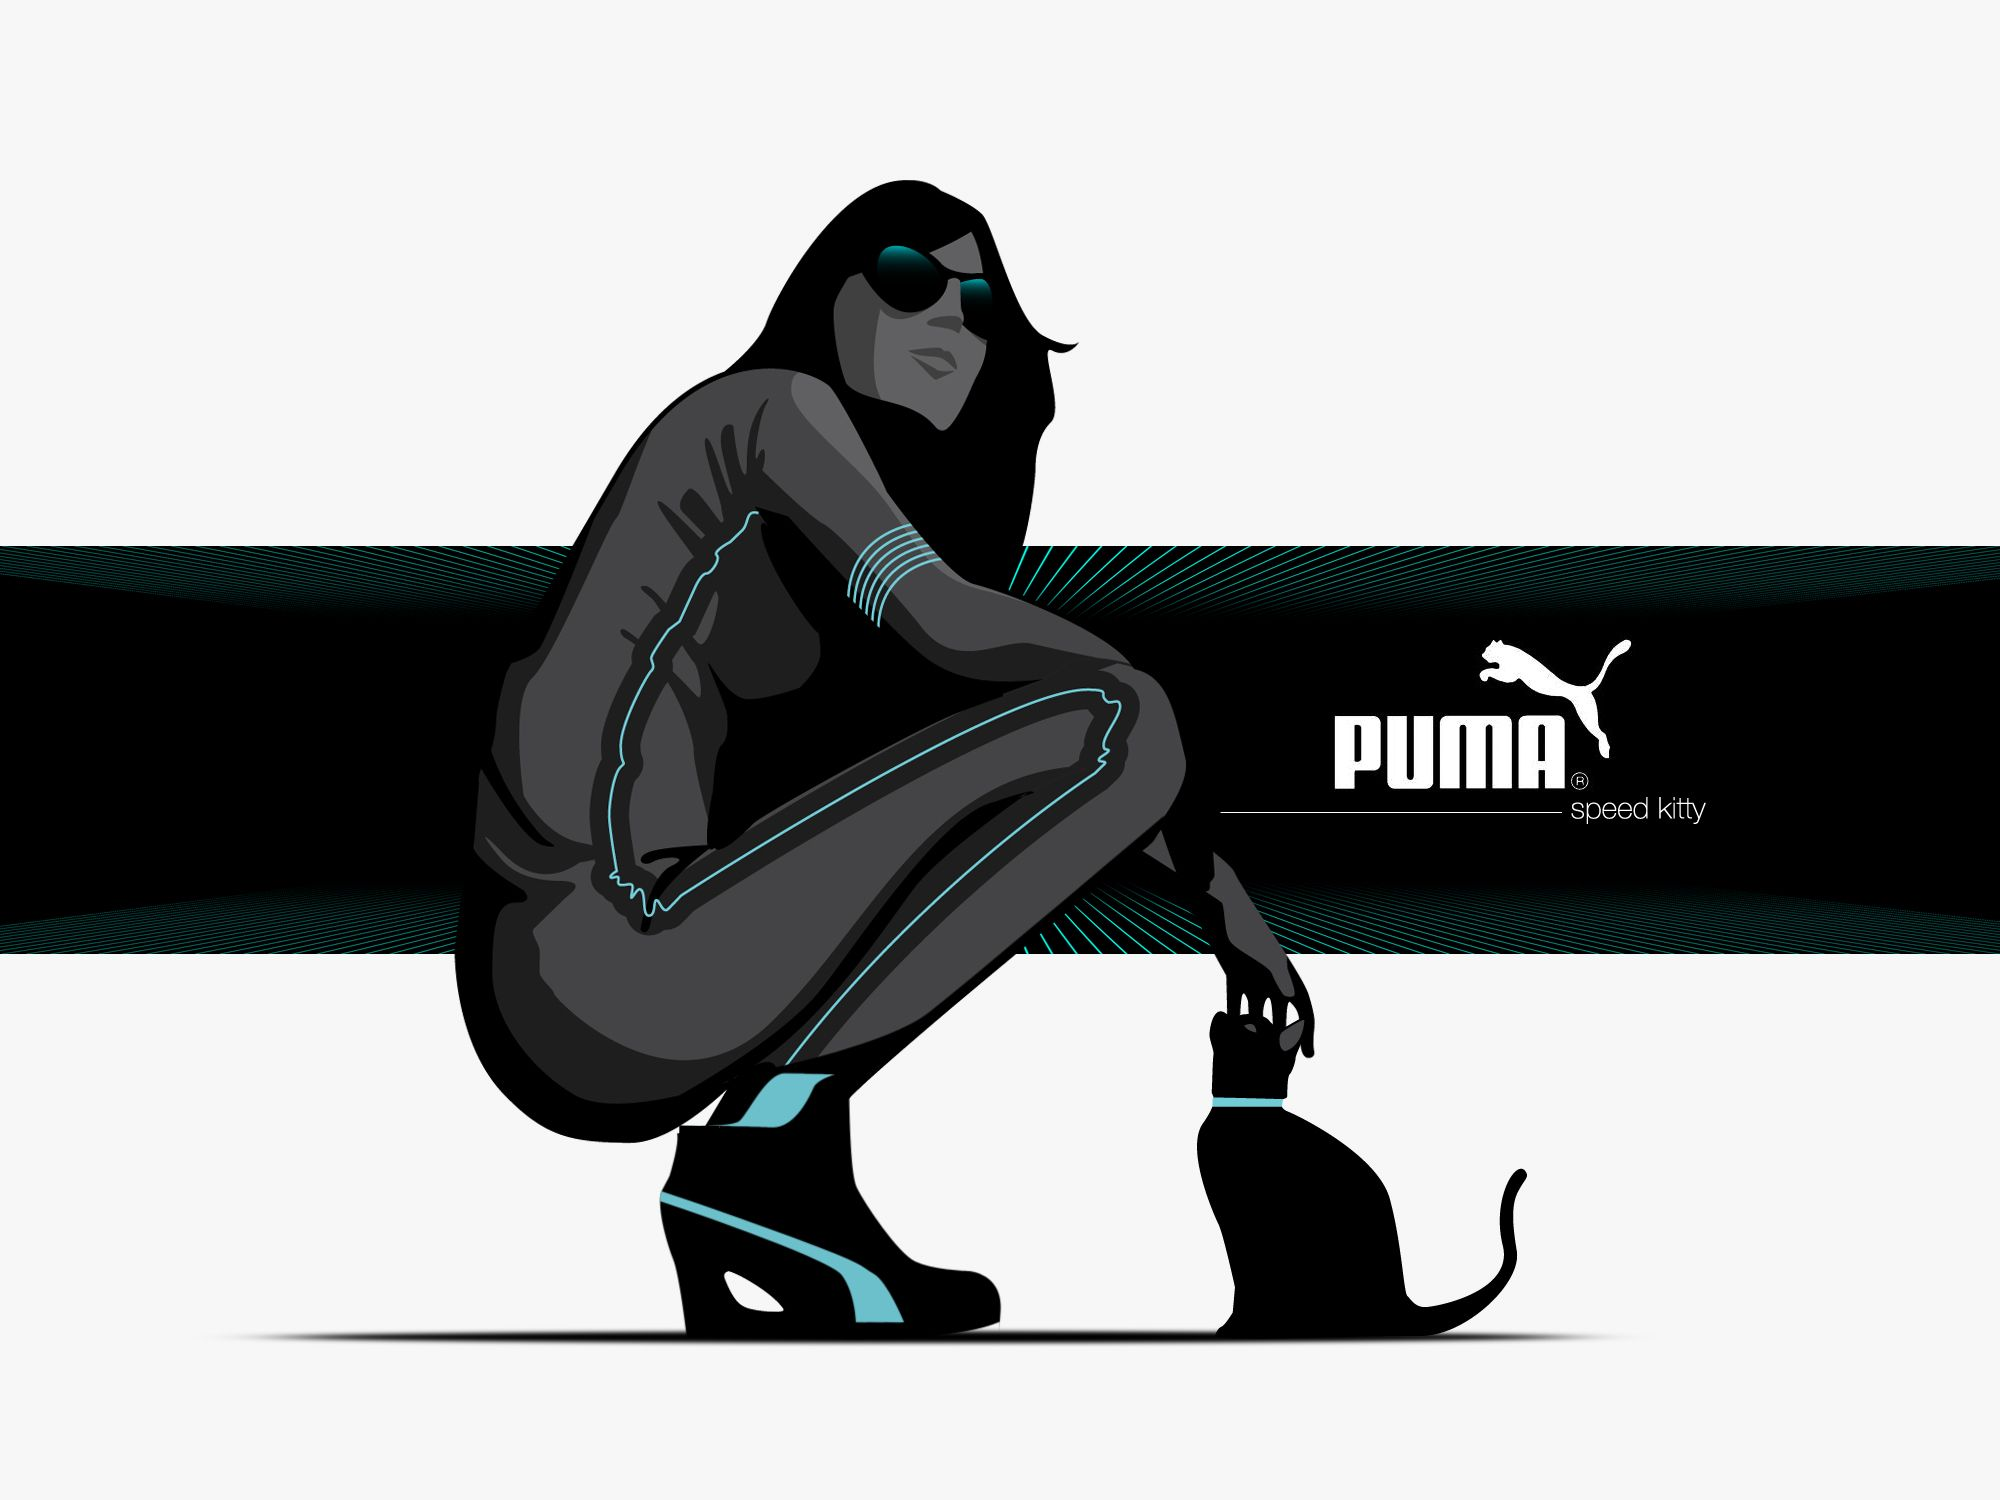 Speed-Kitty concept illustration by Adam Nagy